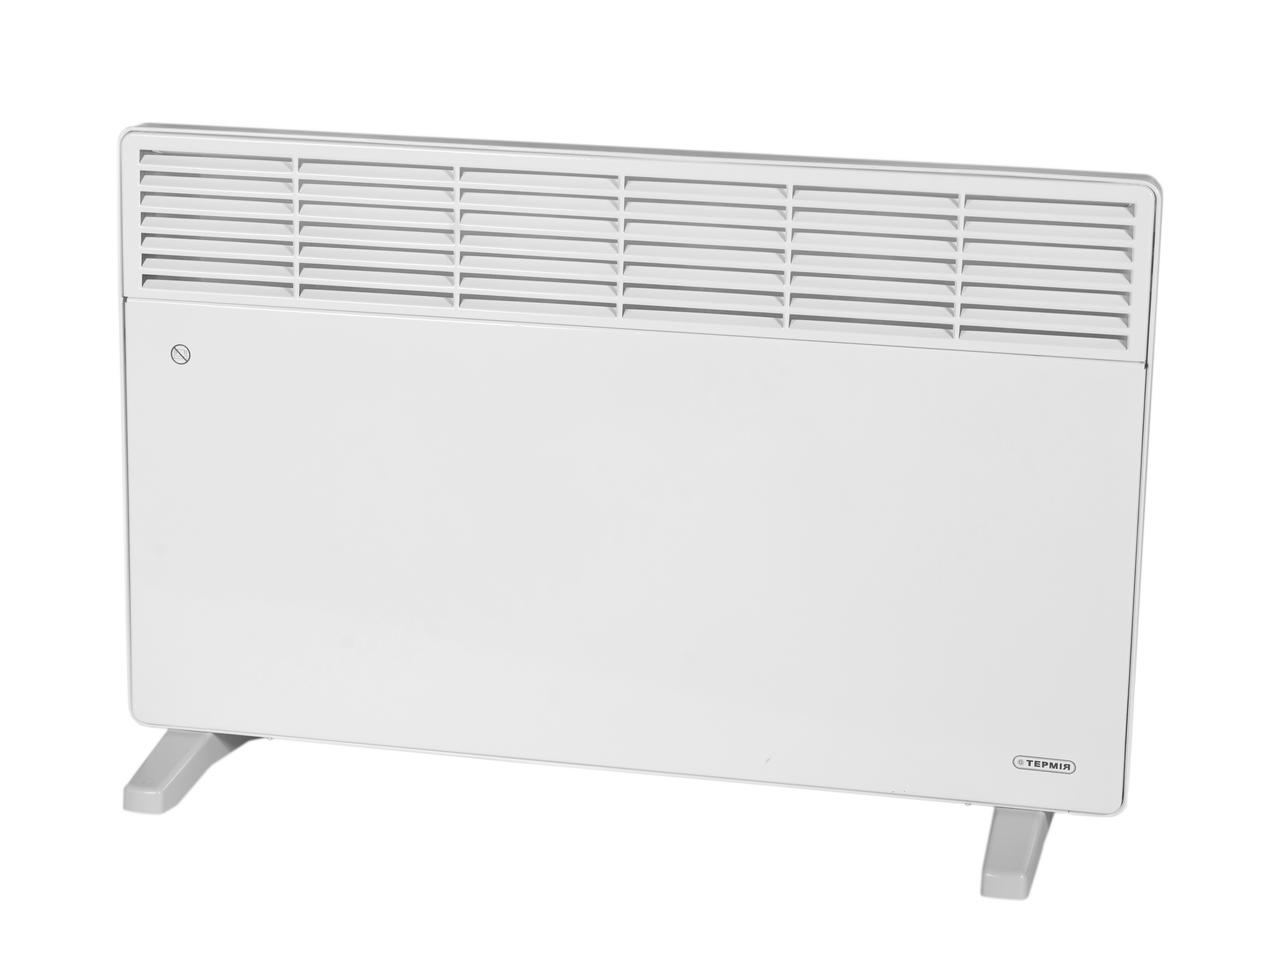 Конвектор электрический Термия Евро ЭВНА-2,0/230 С2 (сш) 2кВт